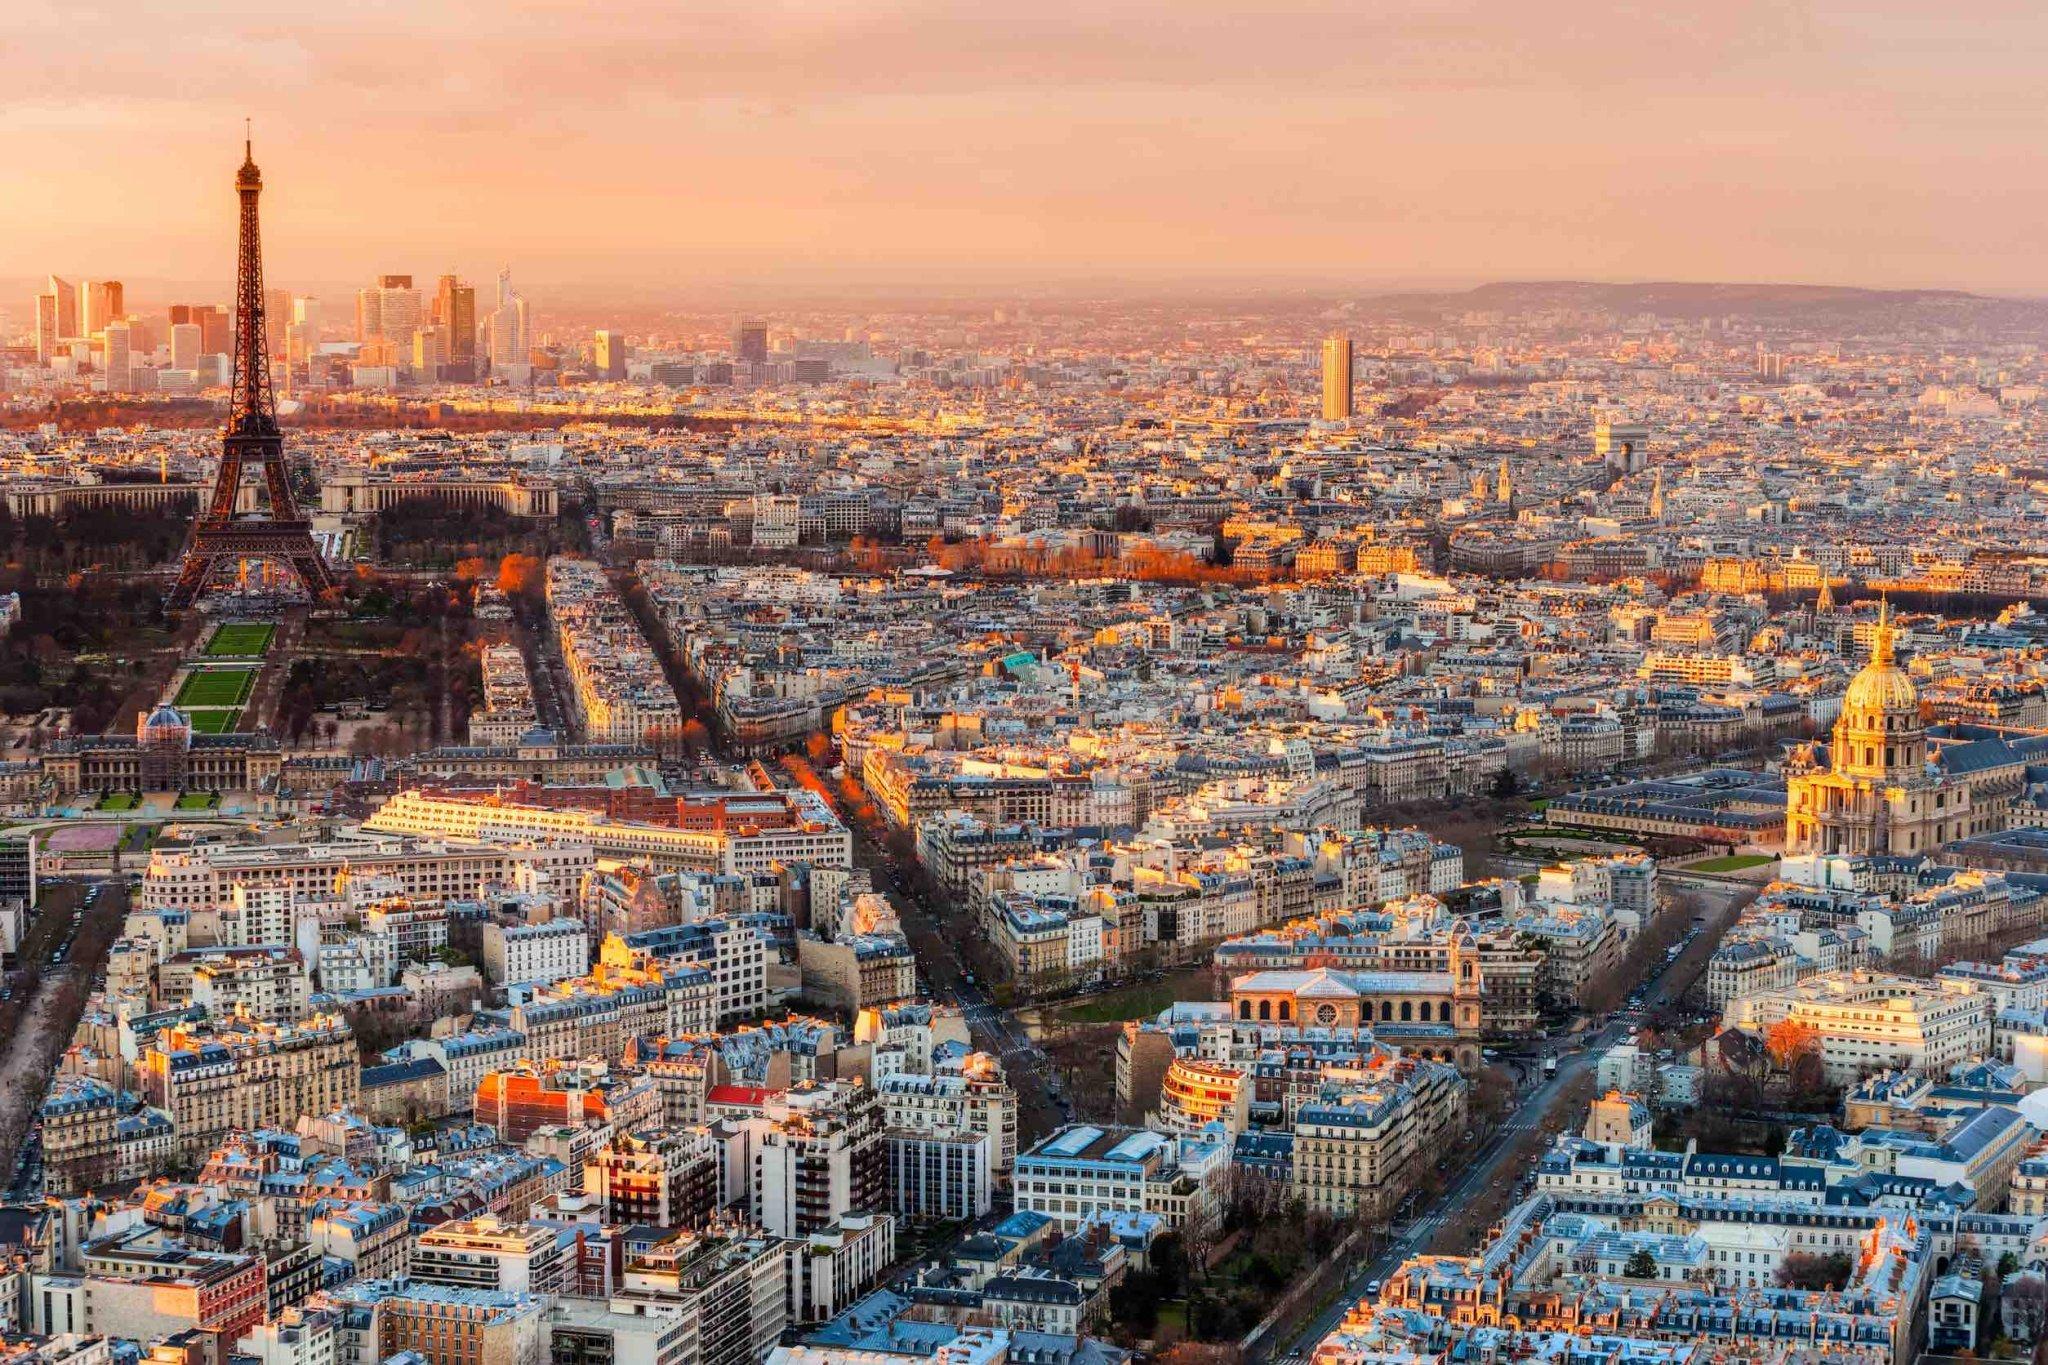 When Will The European Travel Ban End?